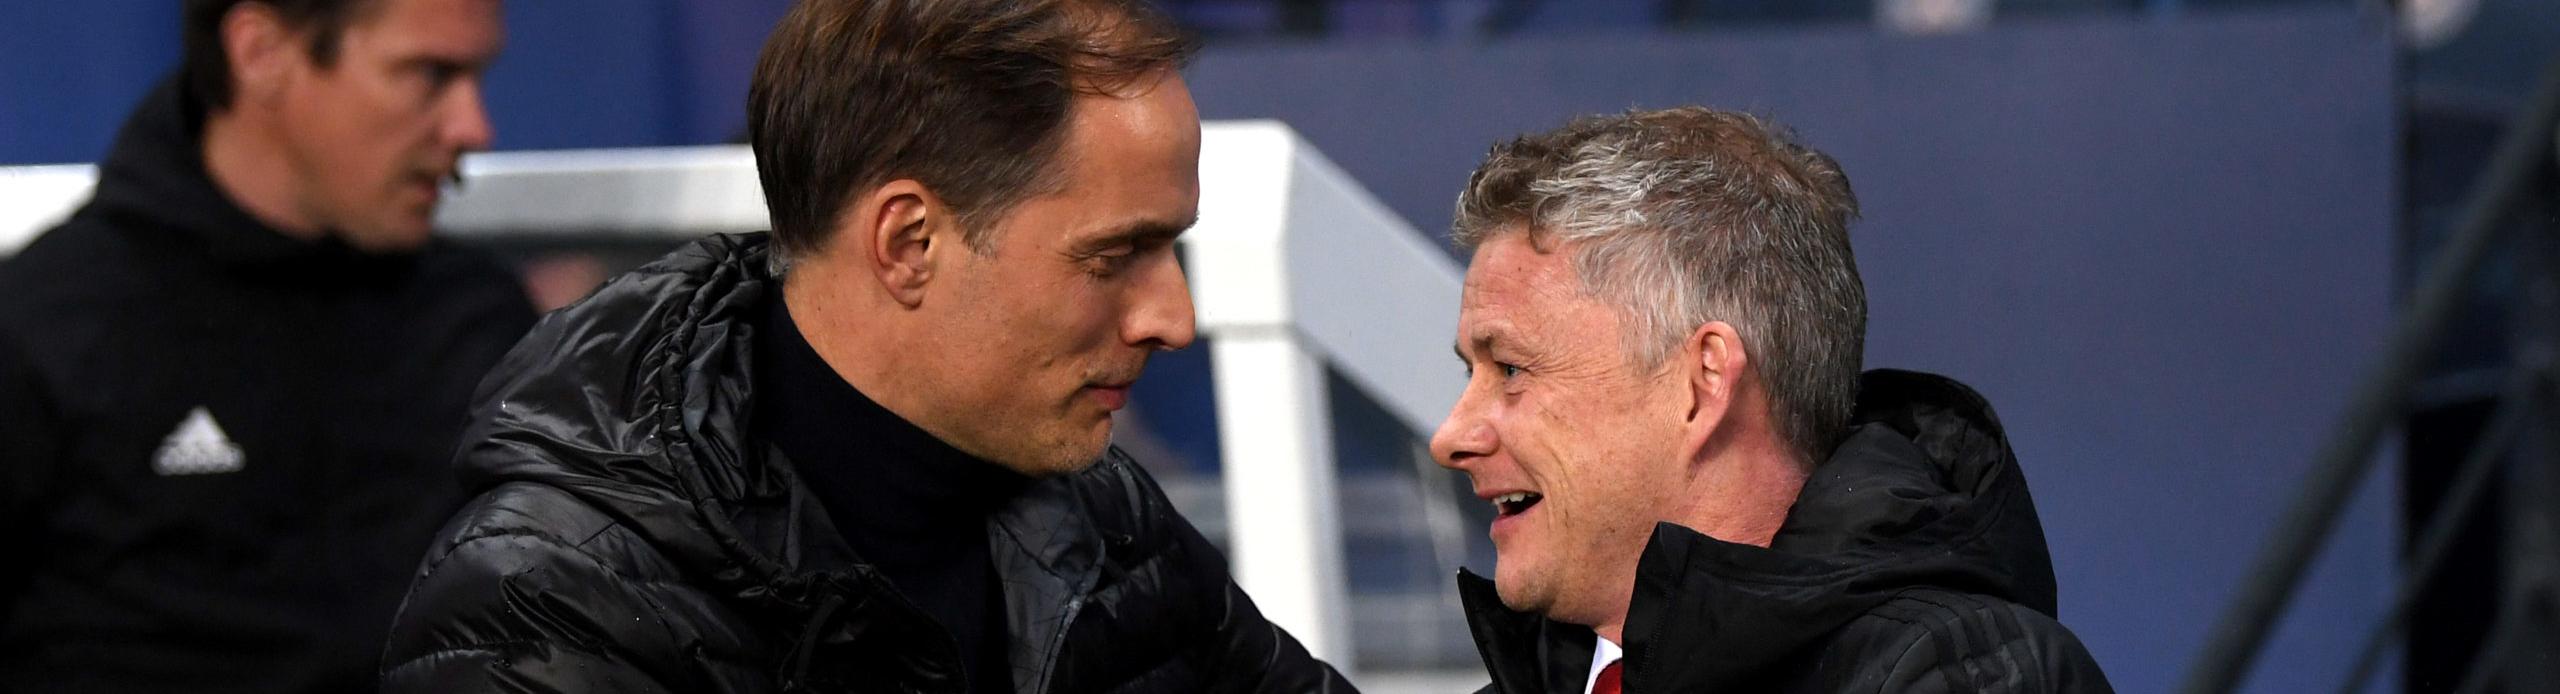 Chelsea-Manchester United, Tuchel e Solskjaer si giocano l'Europa che conta